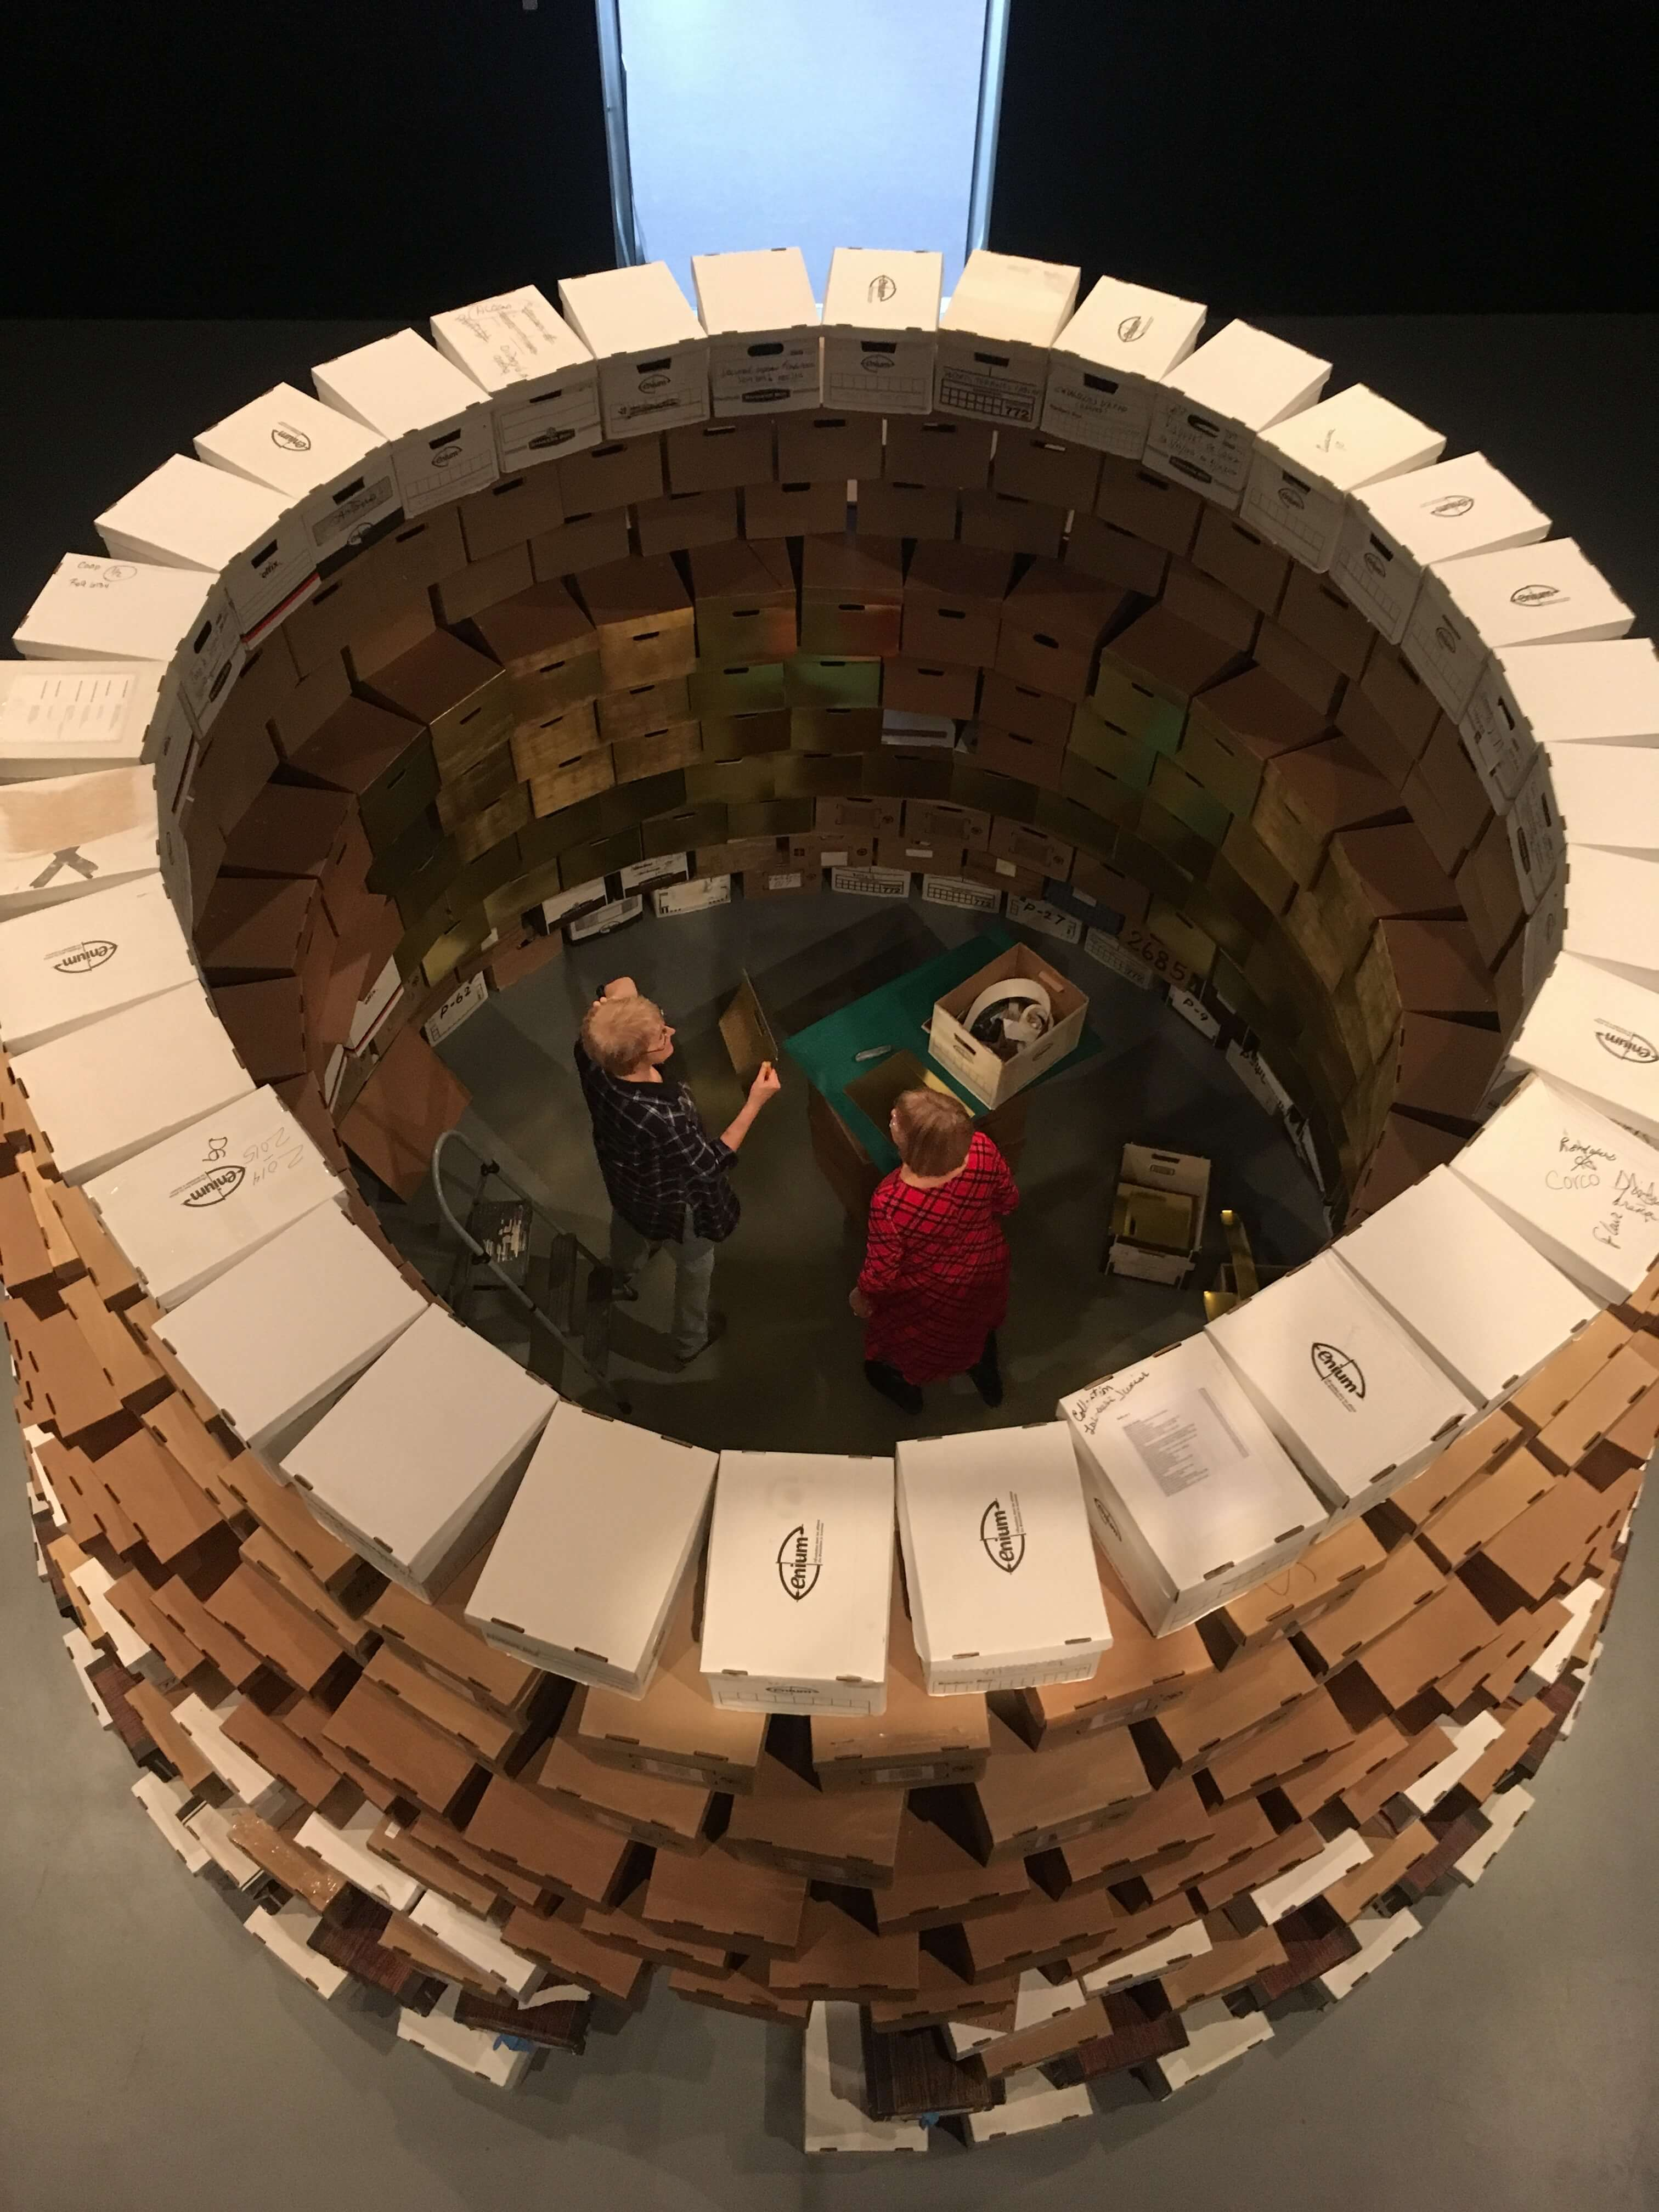 La voute Musee d'art Rouyn-Noranda